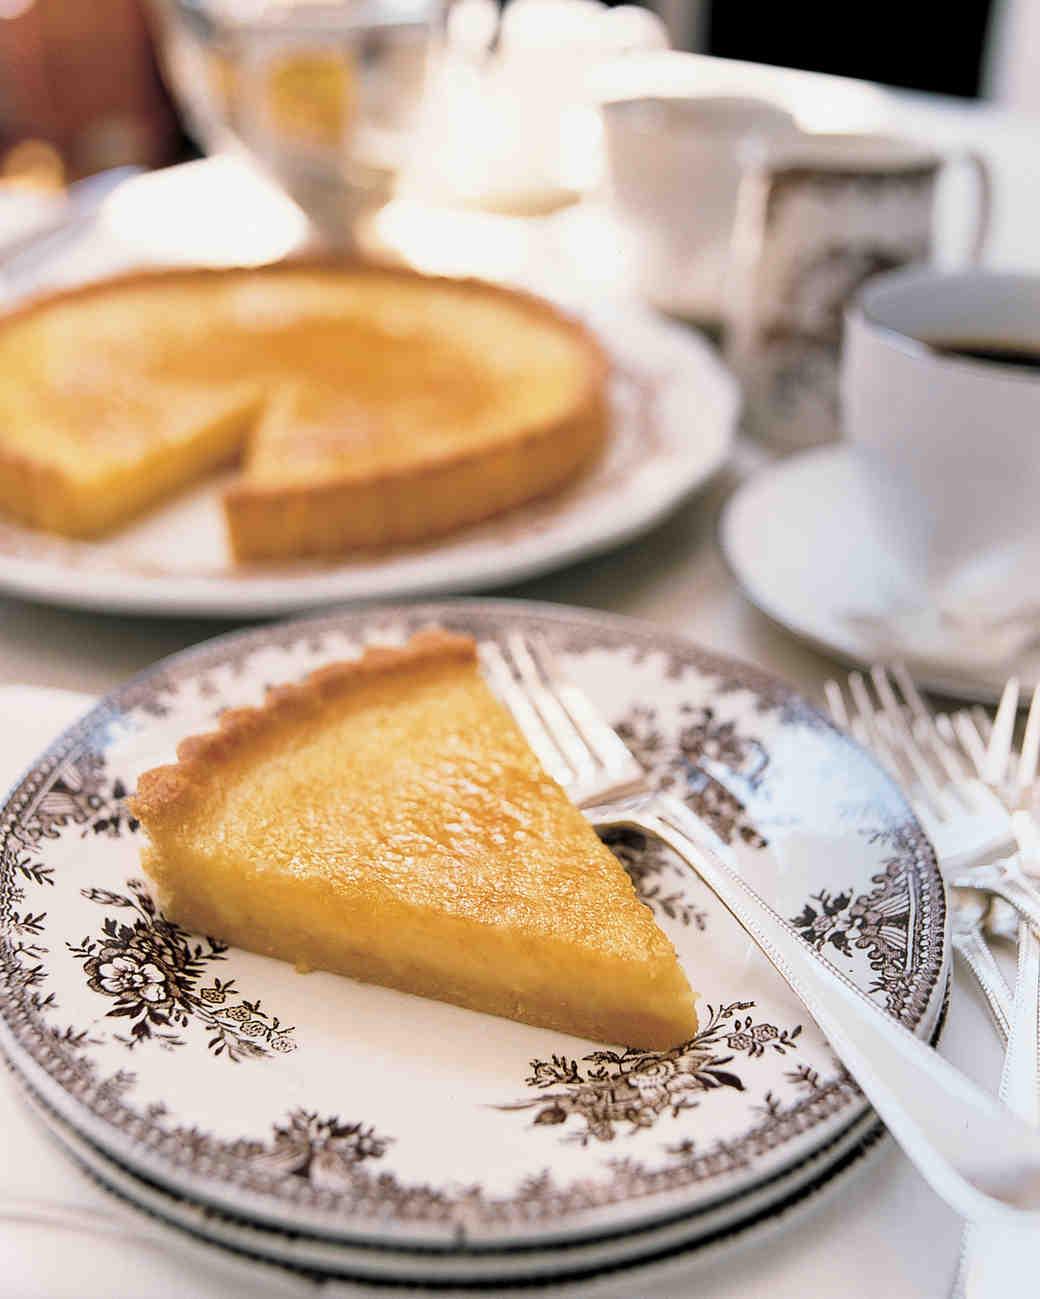 Lemon Tart with Cornmeal Crust